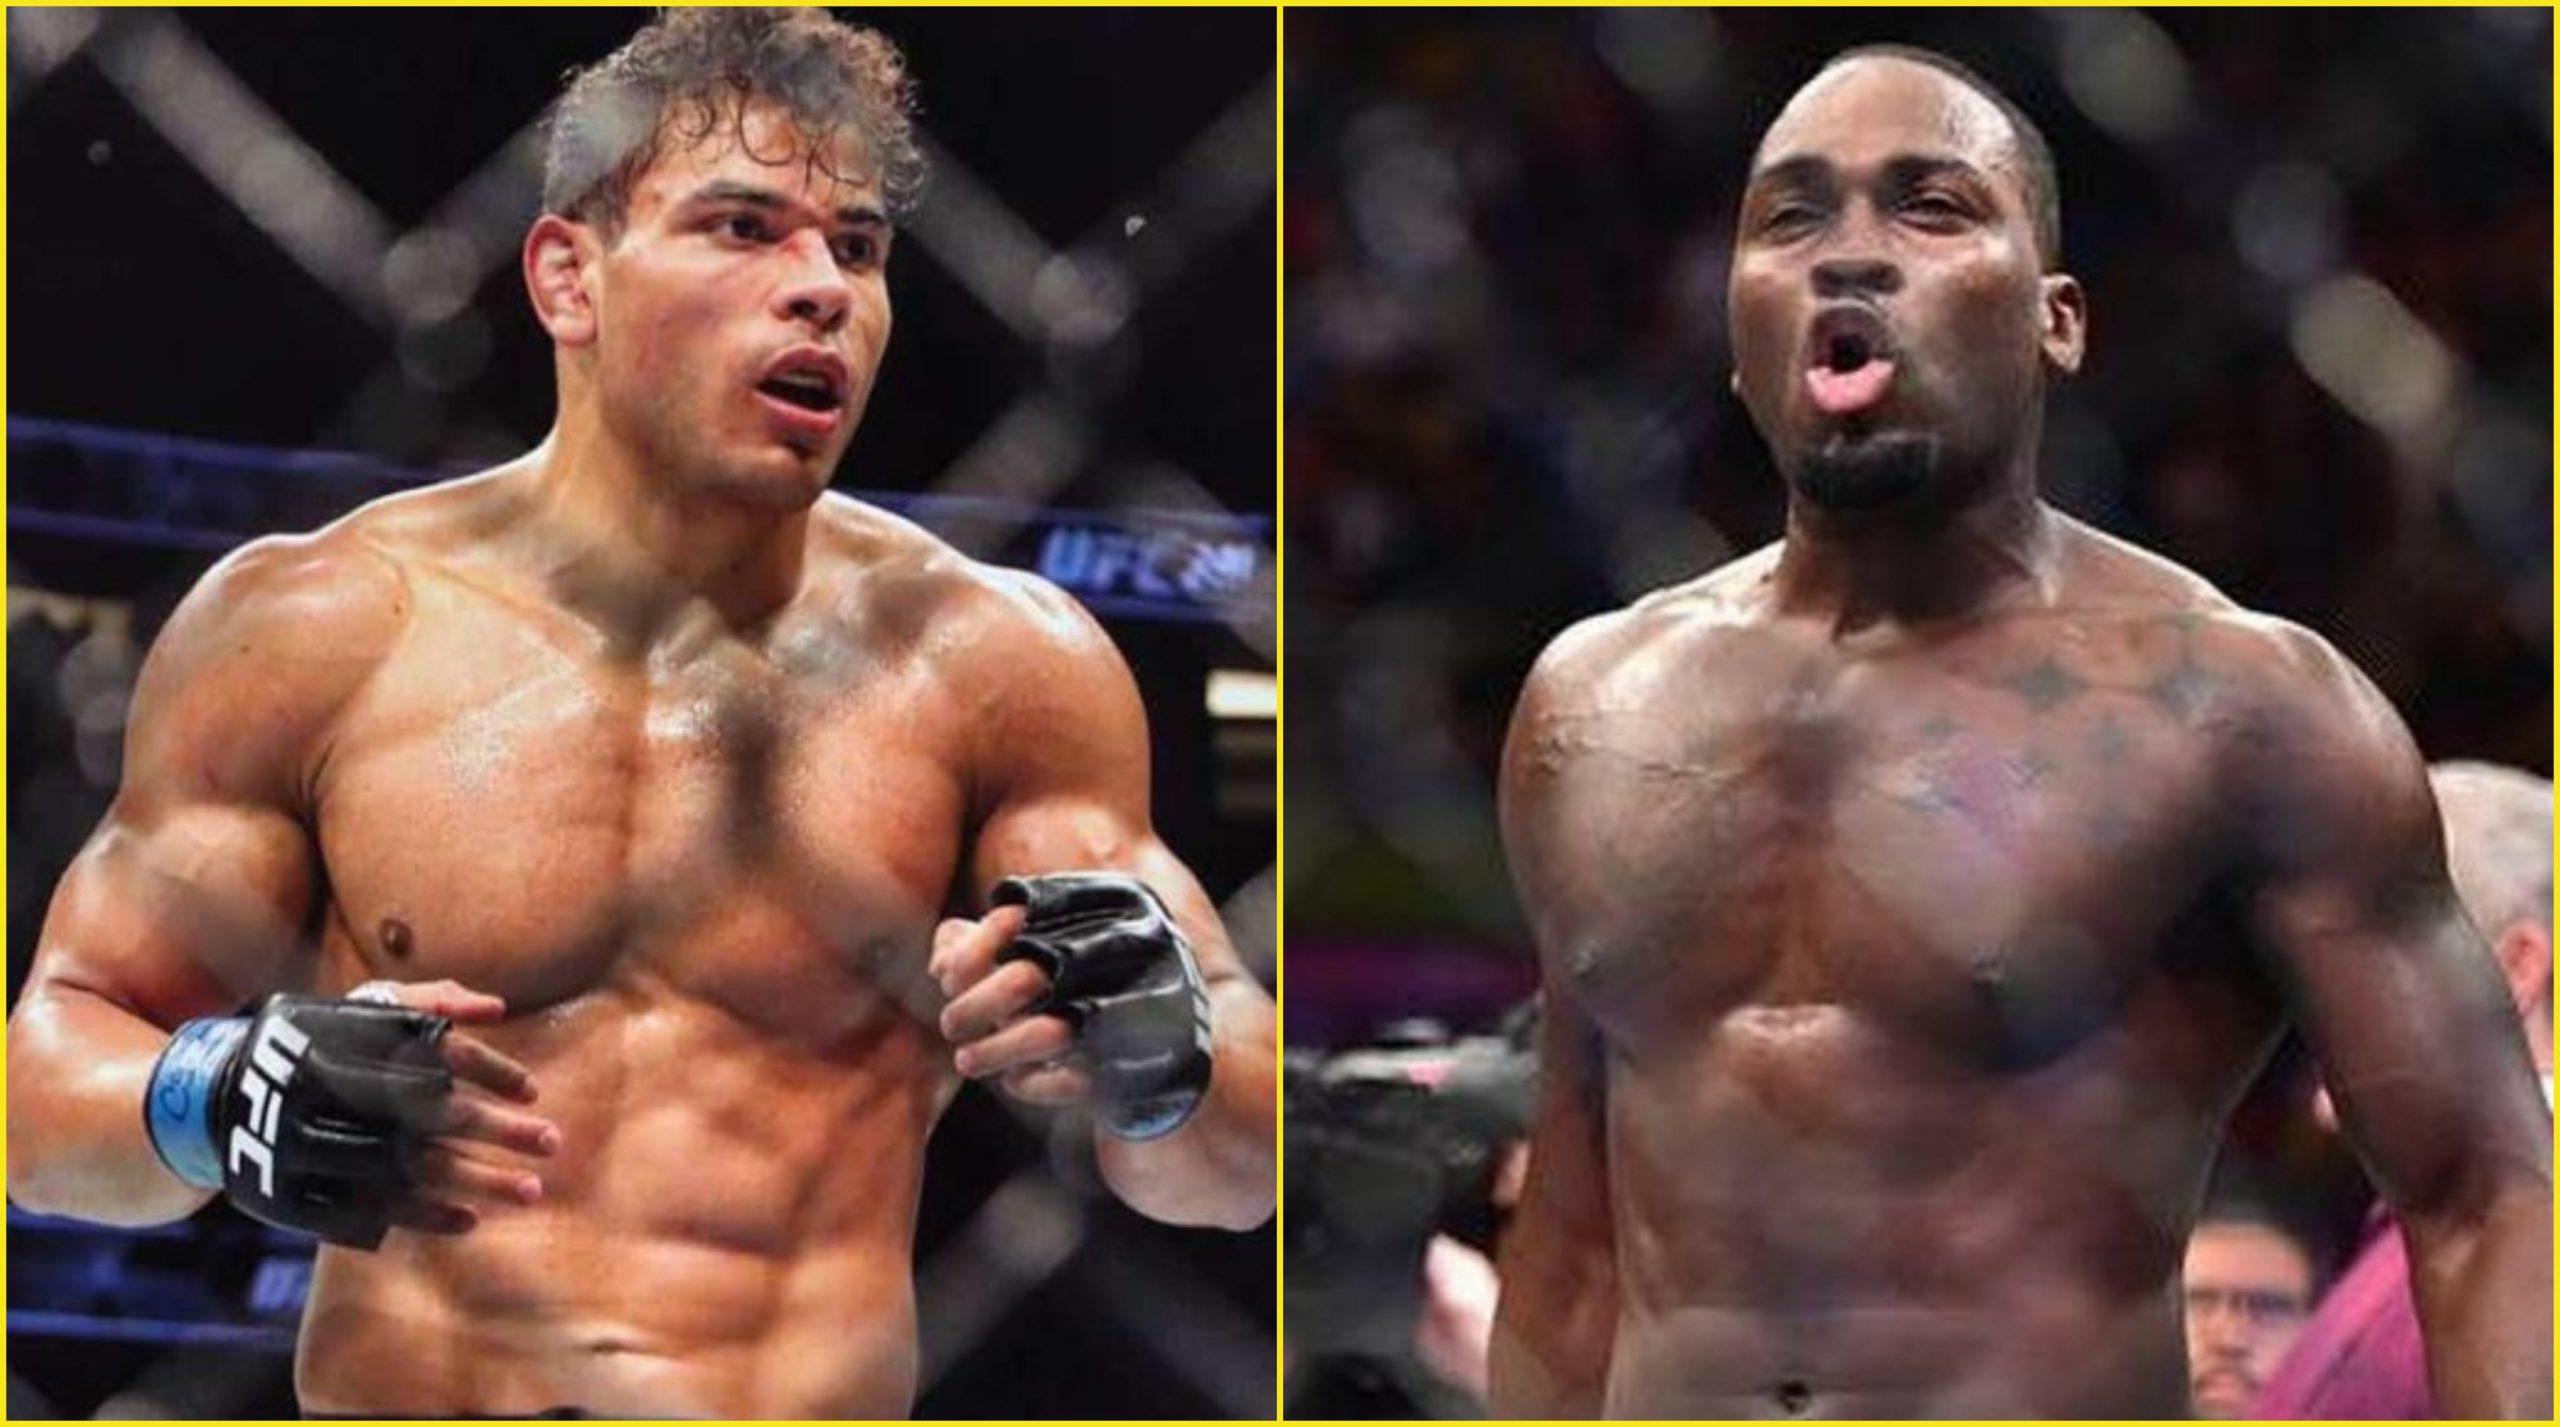 Derek Brunson calls out Paulo Costa for UFC 256 - MMA INDIA